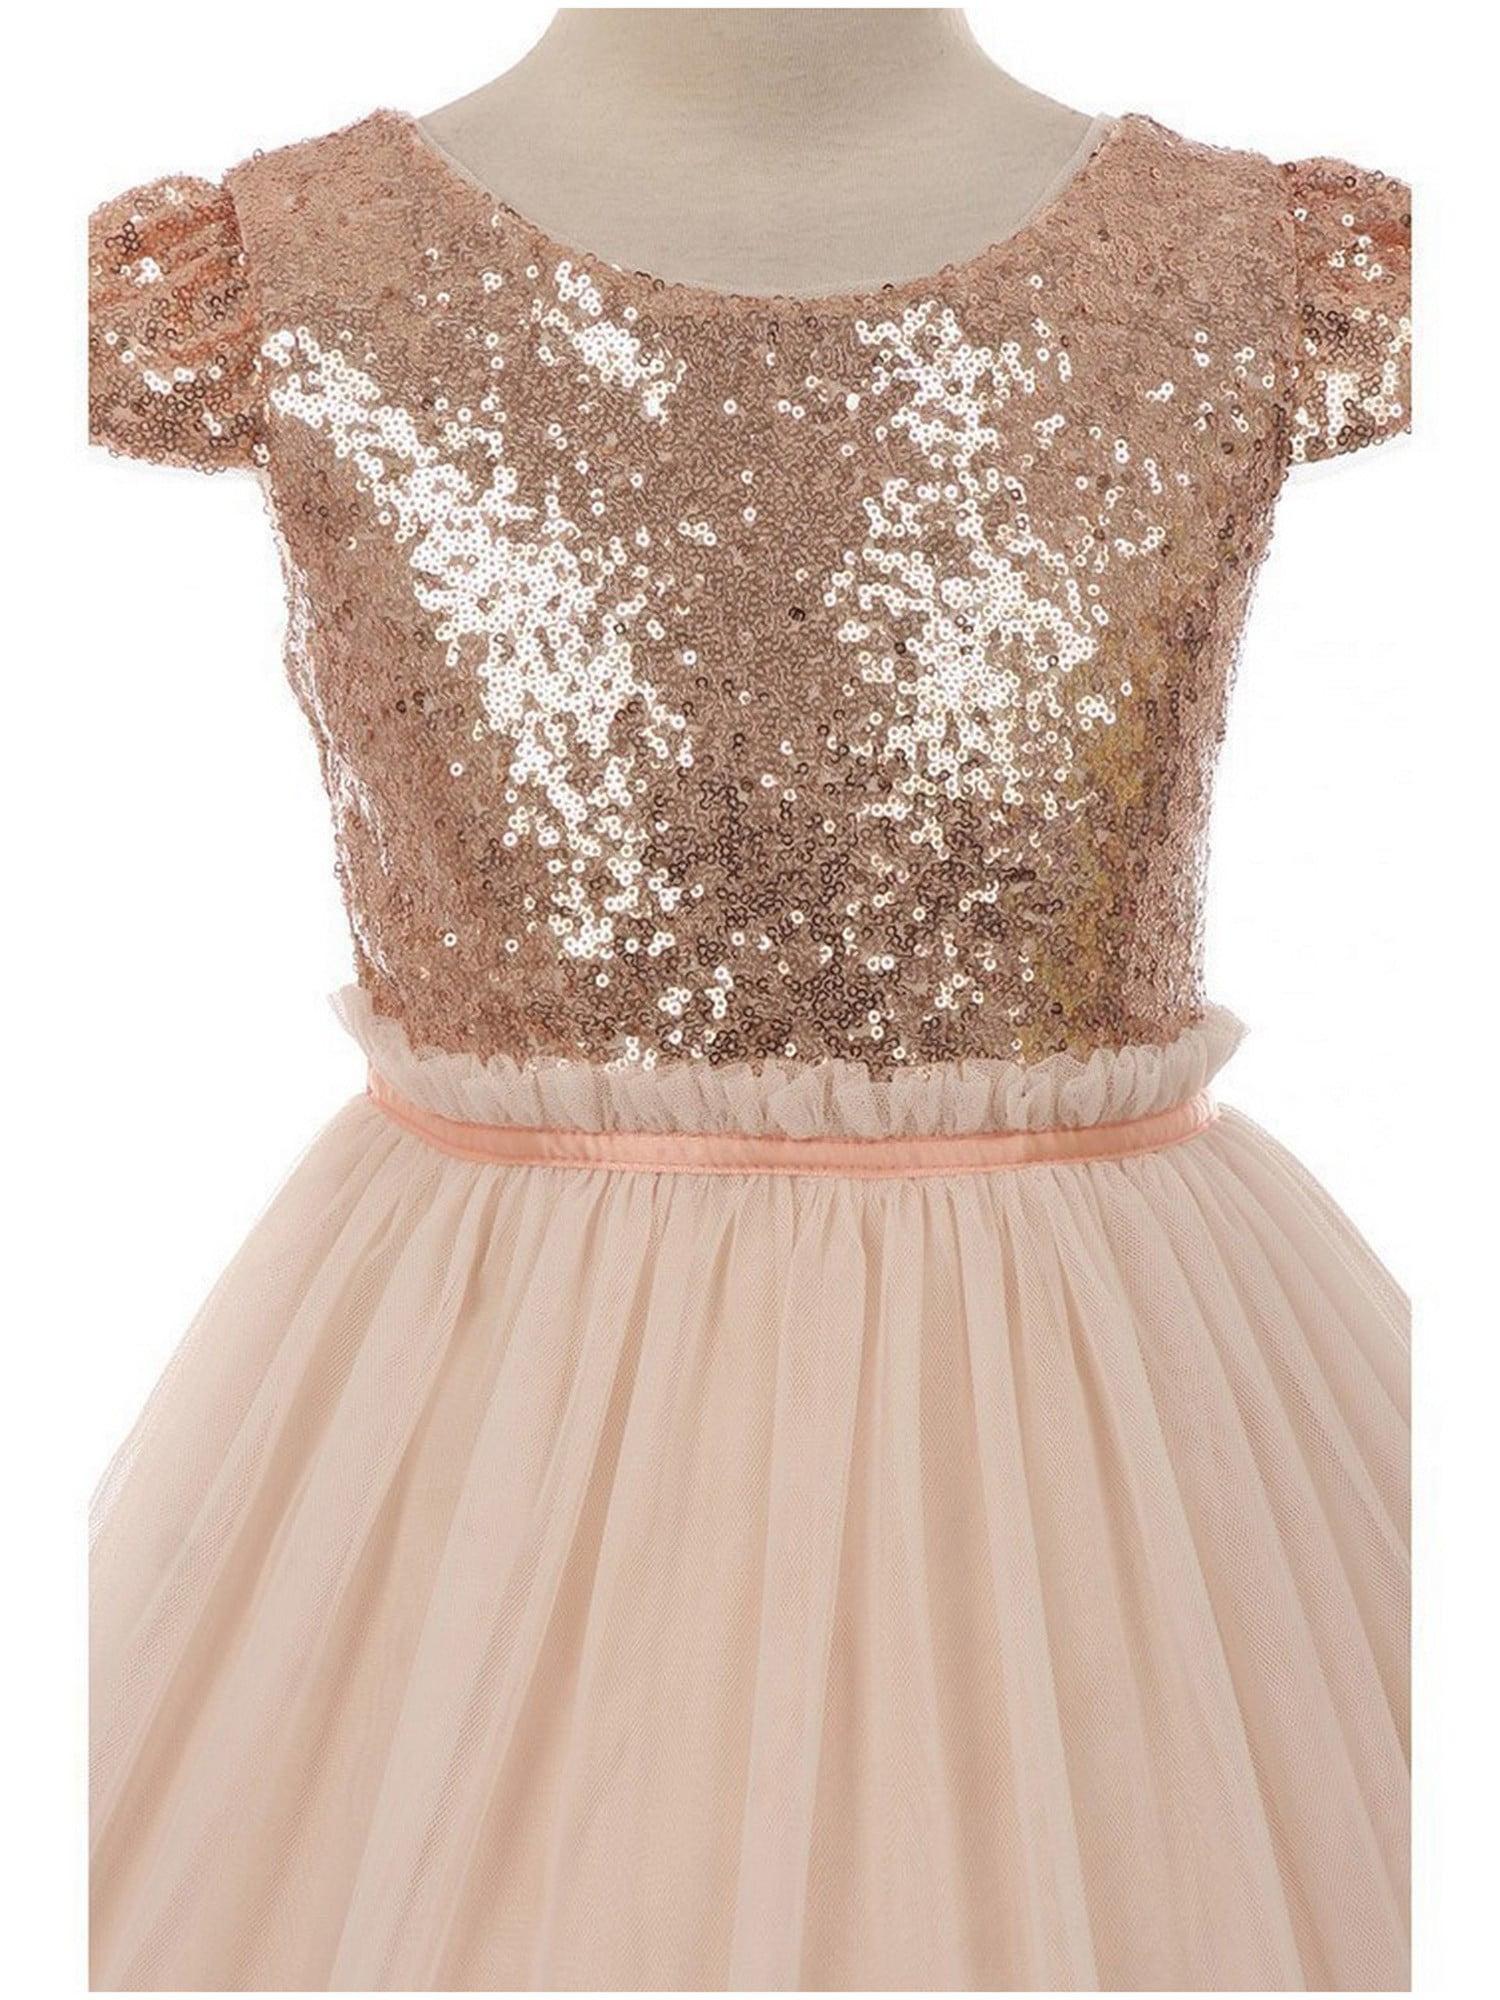 Kids Dream - Kids Dream Girls Blush Sequins Tulle Plus Size ...